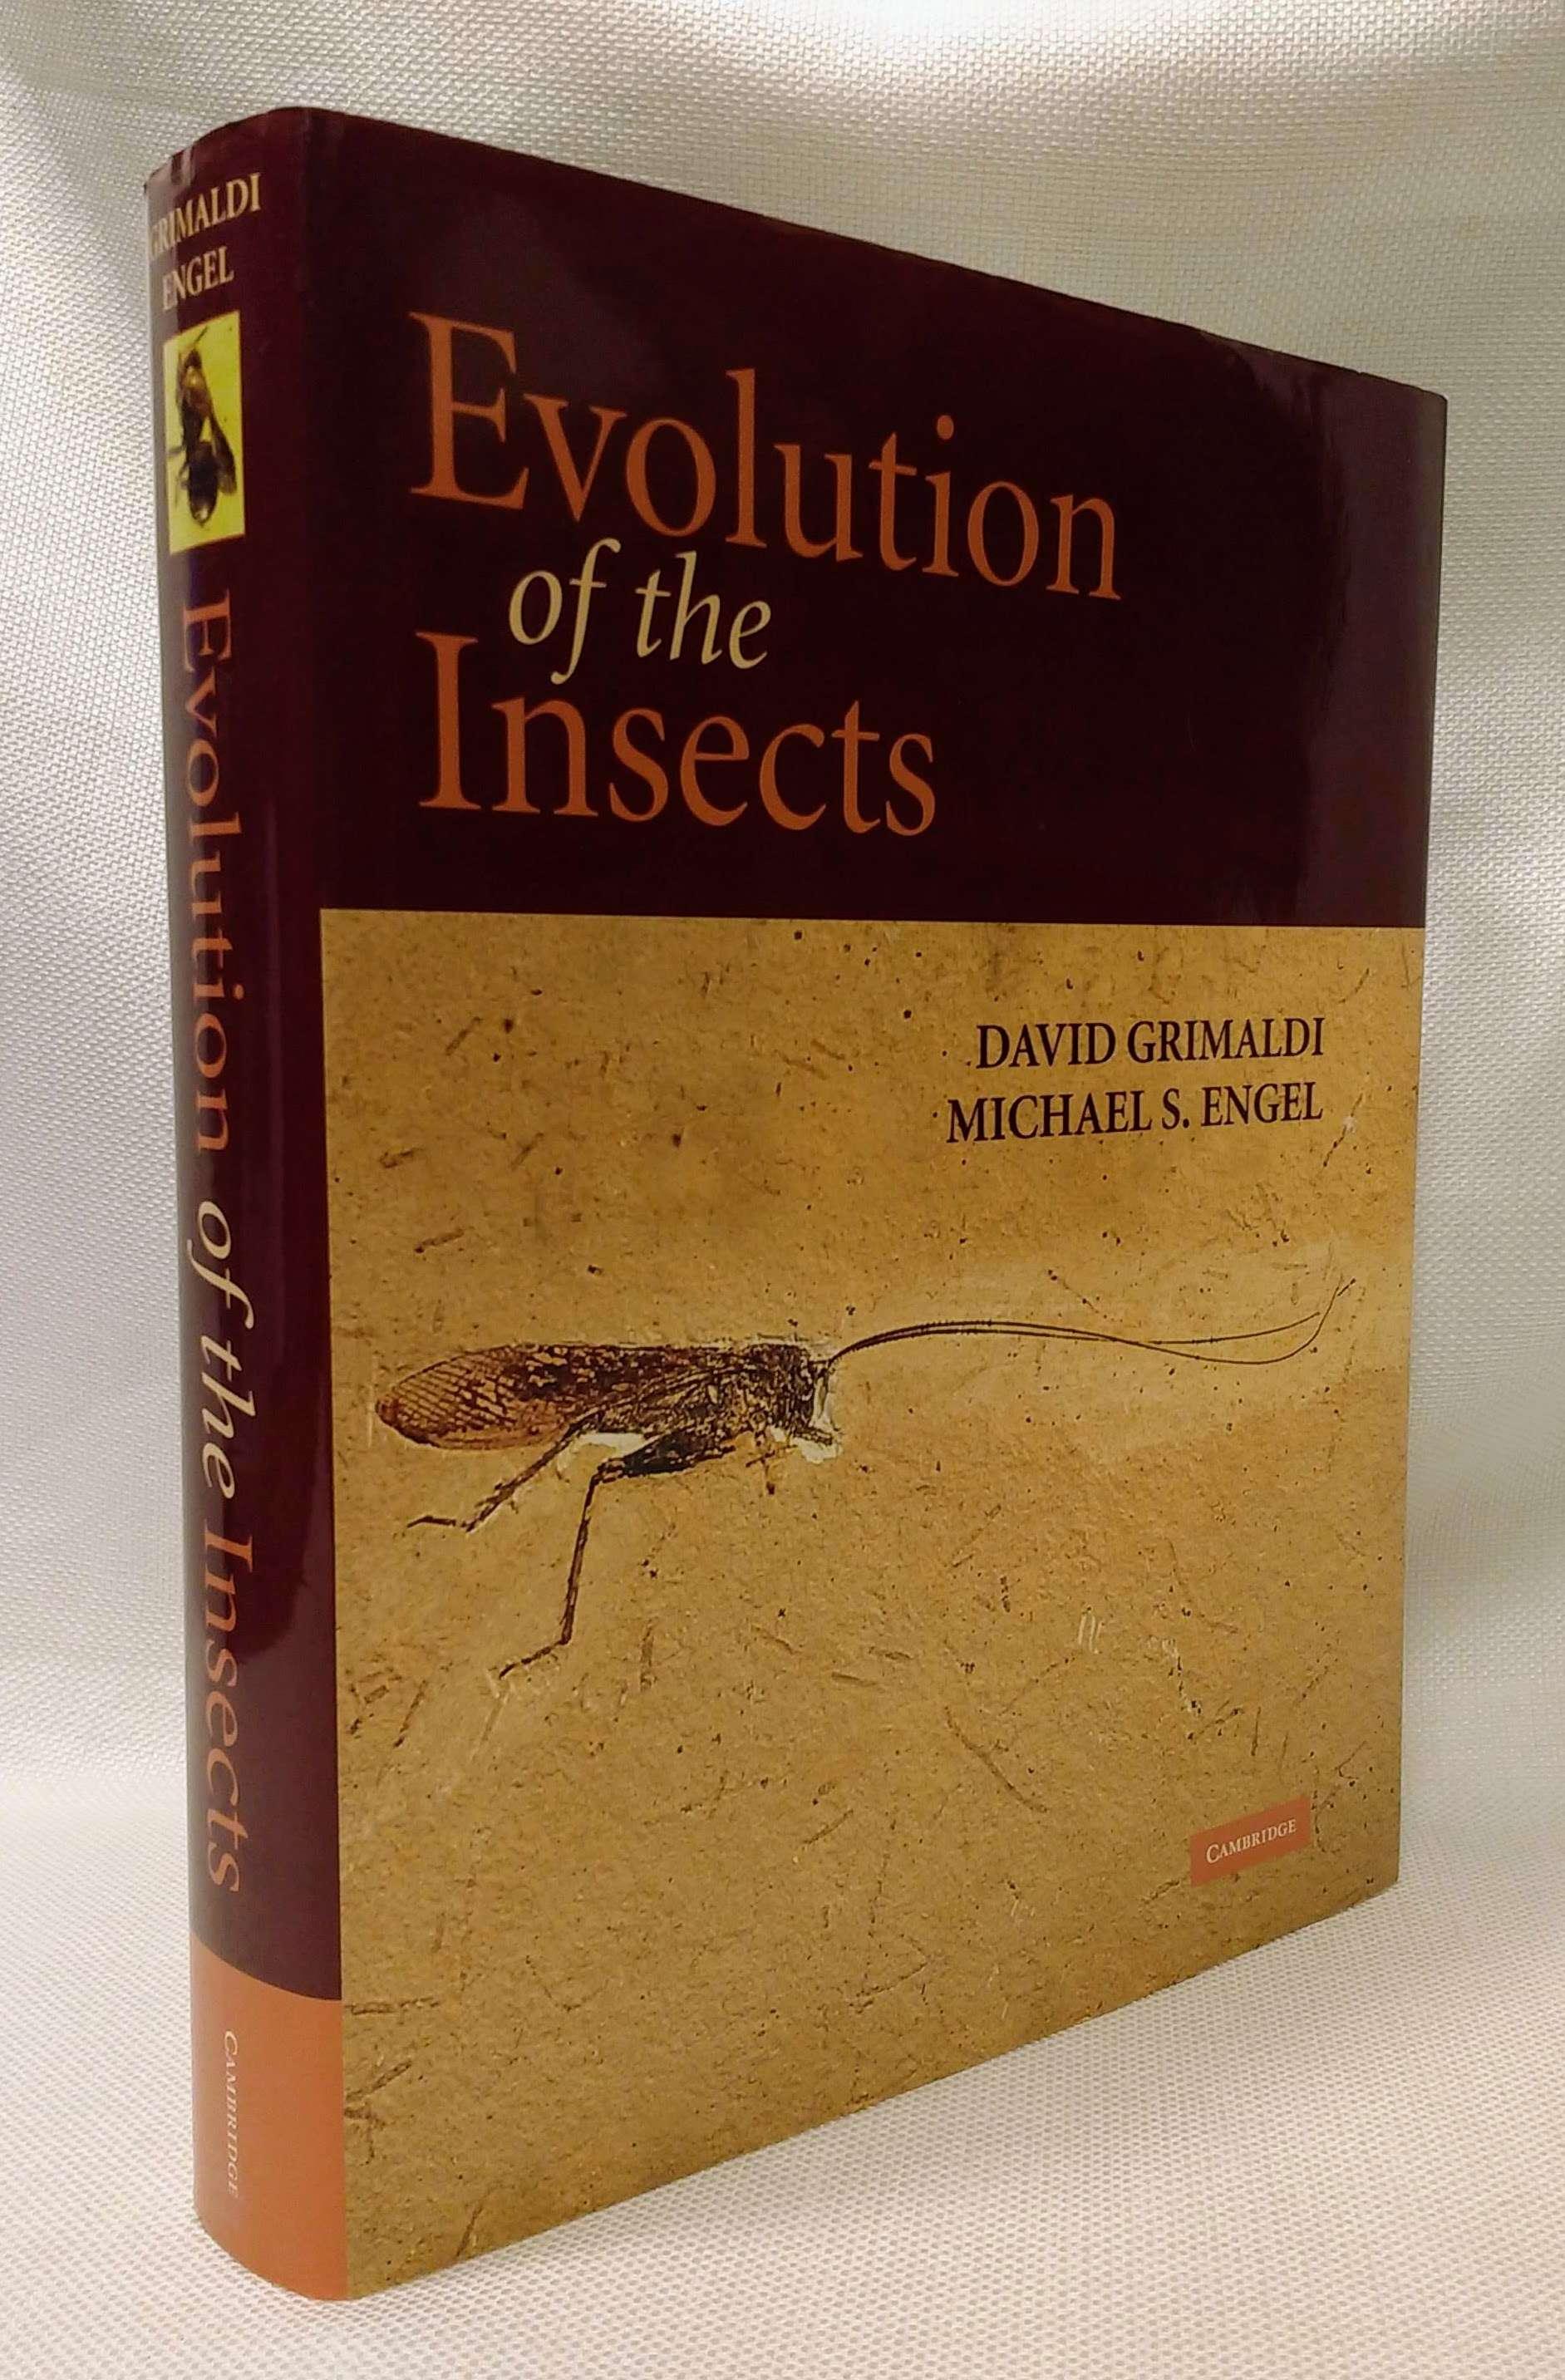 Evolution of the Insects (Cambridge Evolution Series), Grimaldi, David; Engel, Michael S.